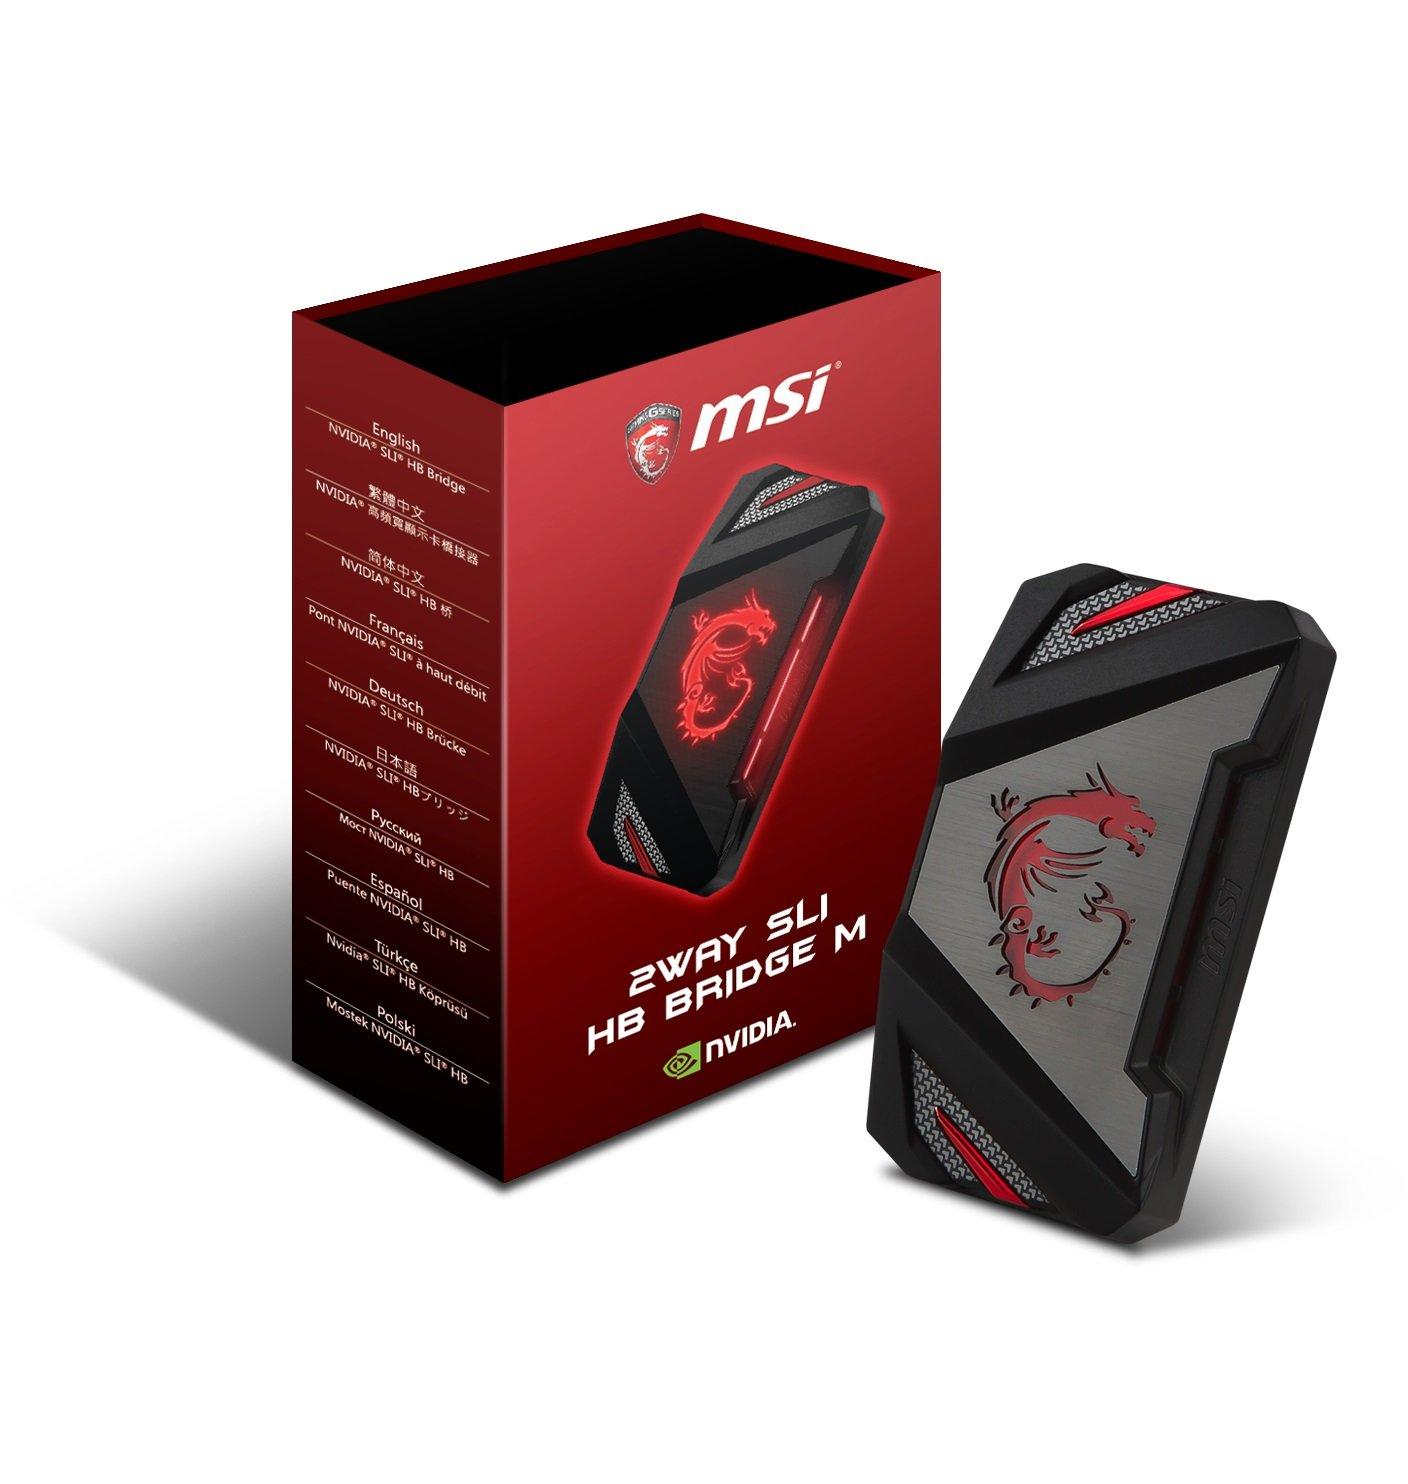 MSI GAMING 5K Video 60mm 2 Way SLI Bridge for GTX 1080 1070 Series Graphics Card (2WAY SLI HB BRIDGE M)